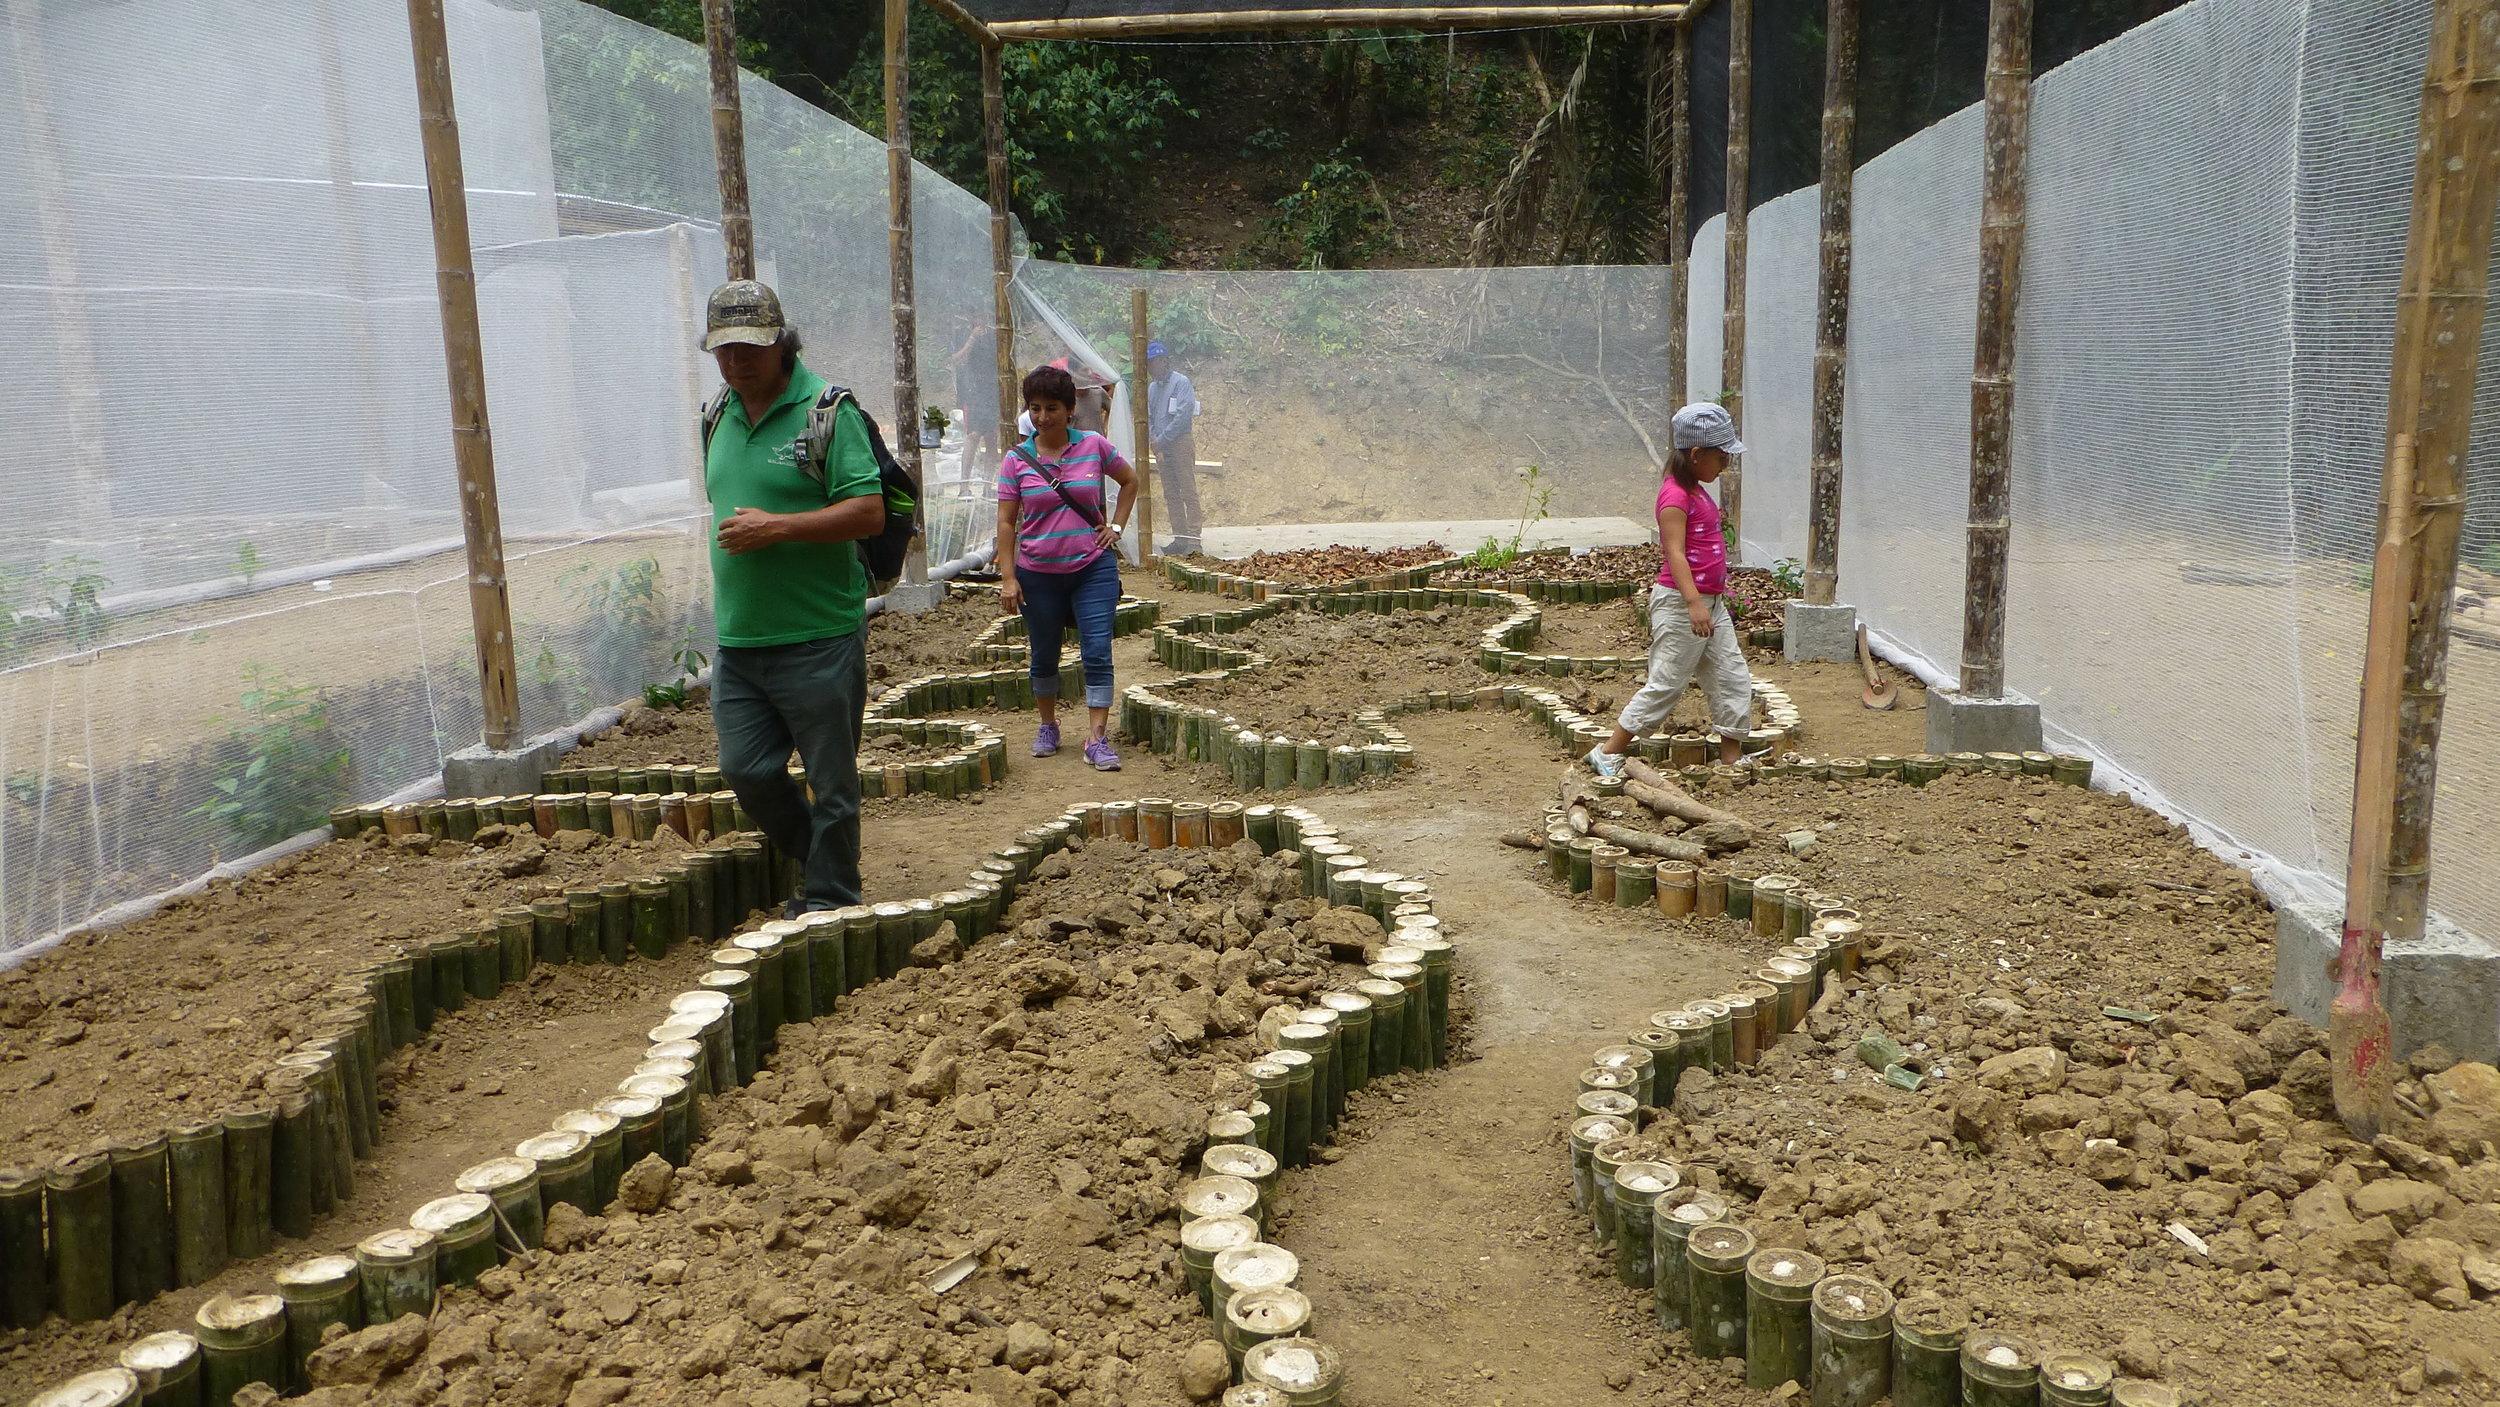 Butterfly Garden Pisloy Tataniche Ecuador